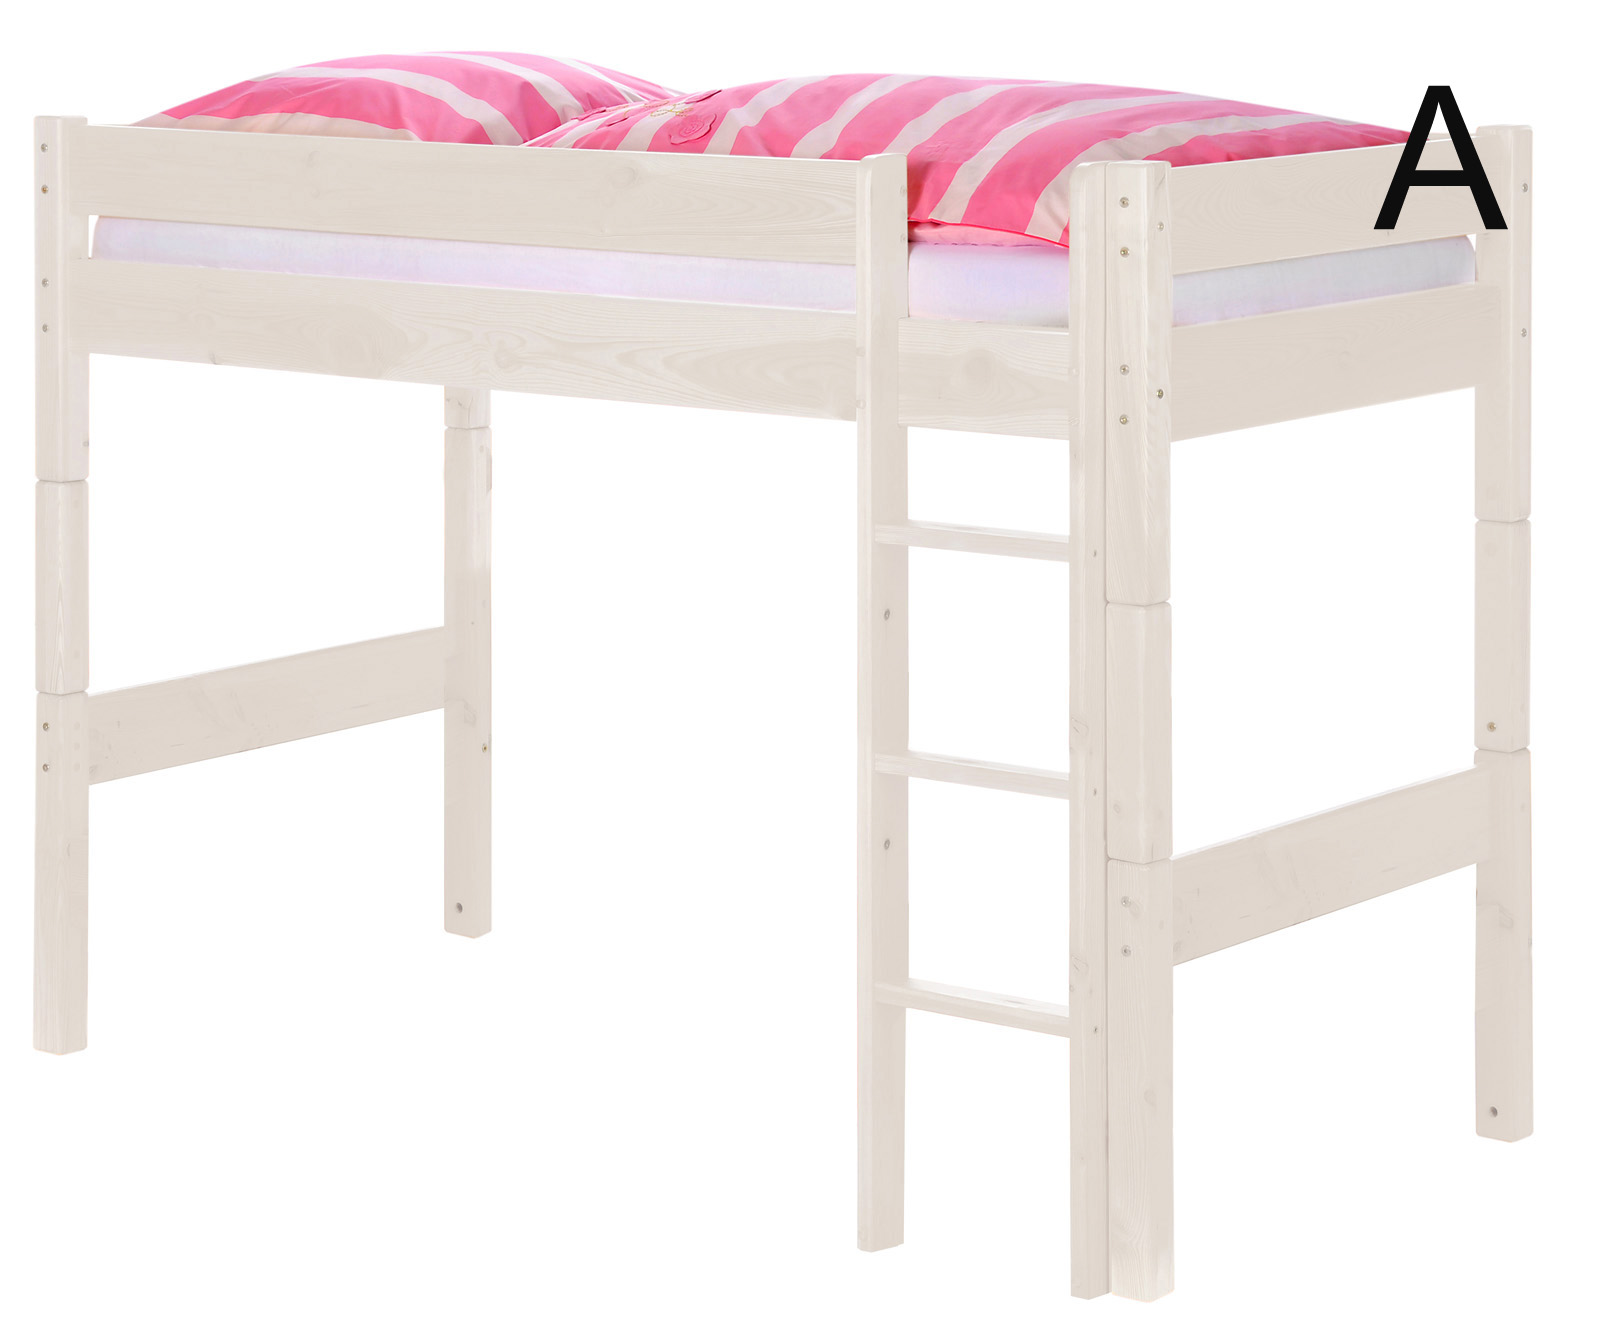 sam kinder hochbett wei optional massivholz wolke7 auf. Black Bedroom Furniture Sets. Home Design Ideas